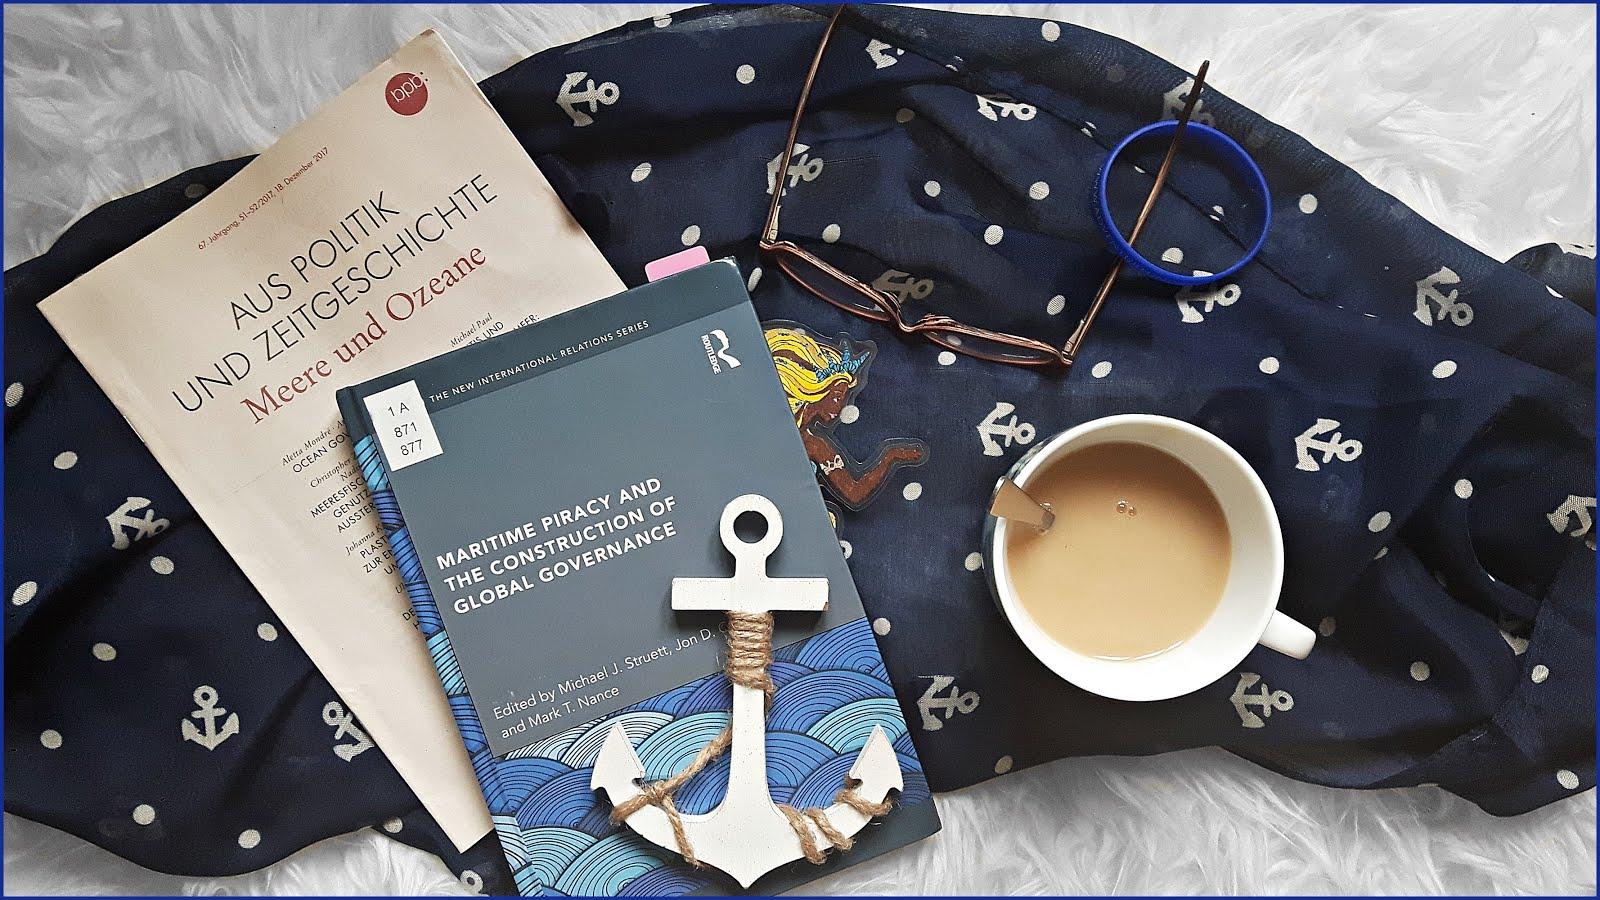 Corona Kein Panik Coronapanik Don´t Panic Bachelorarbeit Maritime Piracy Tee